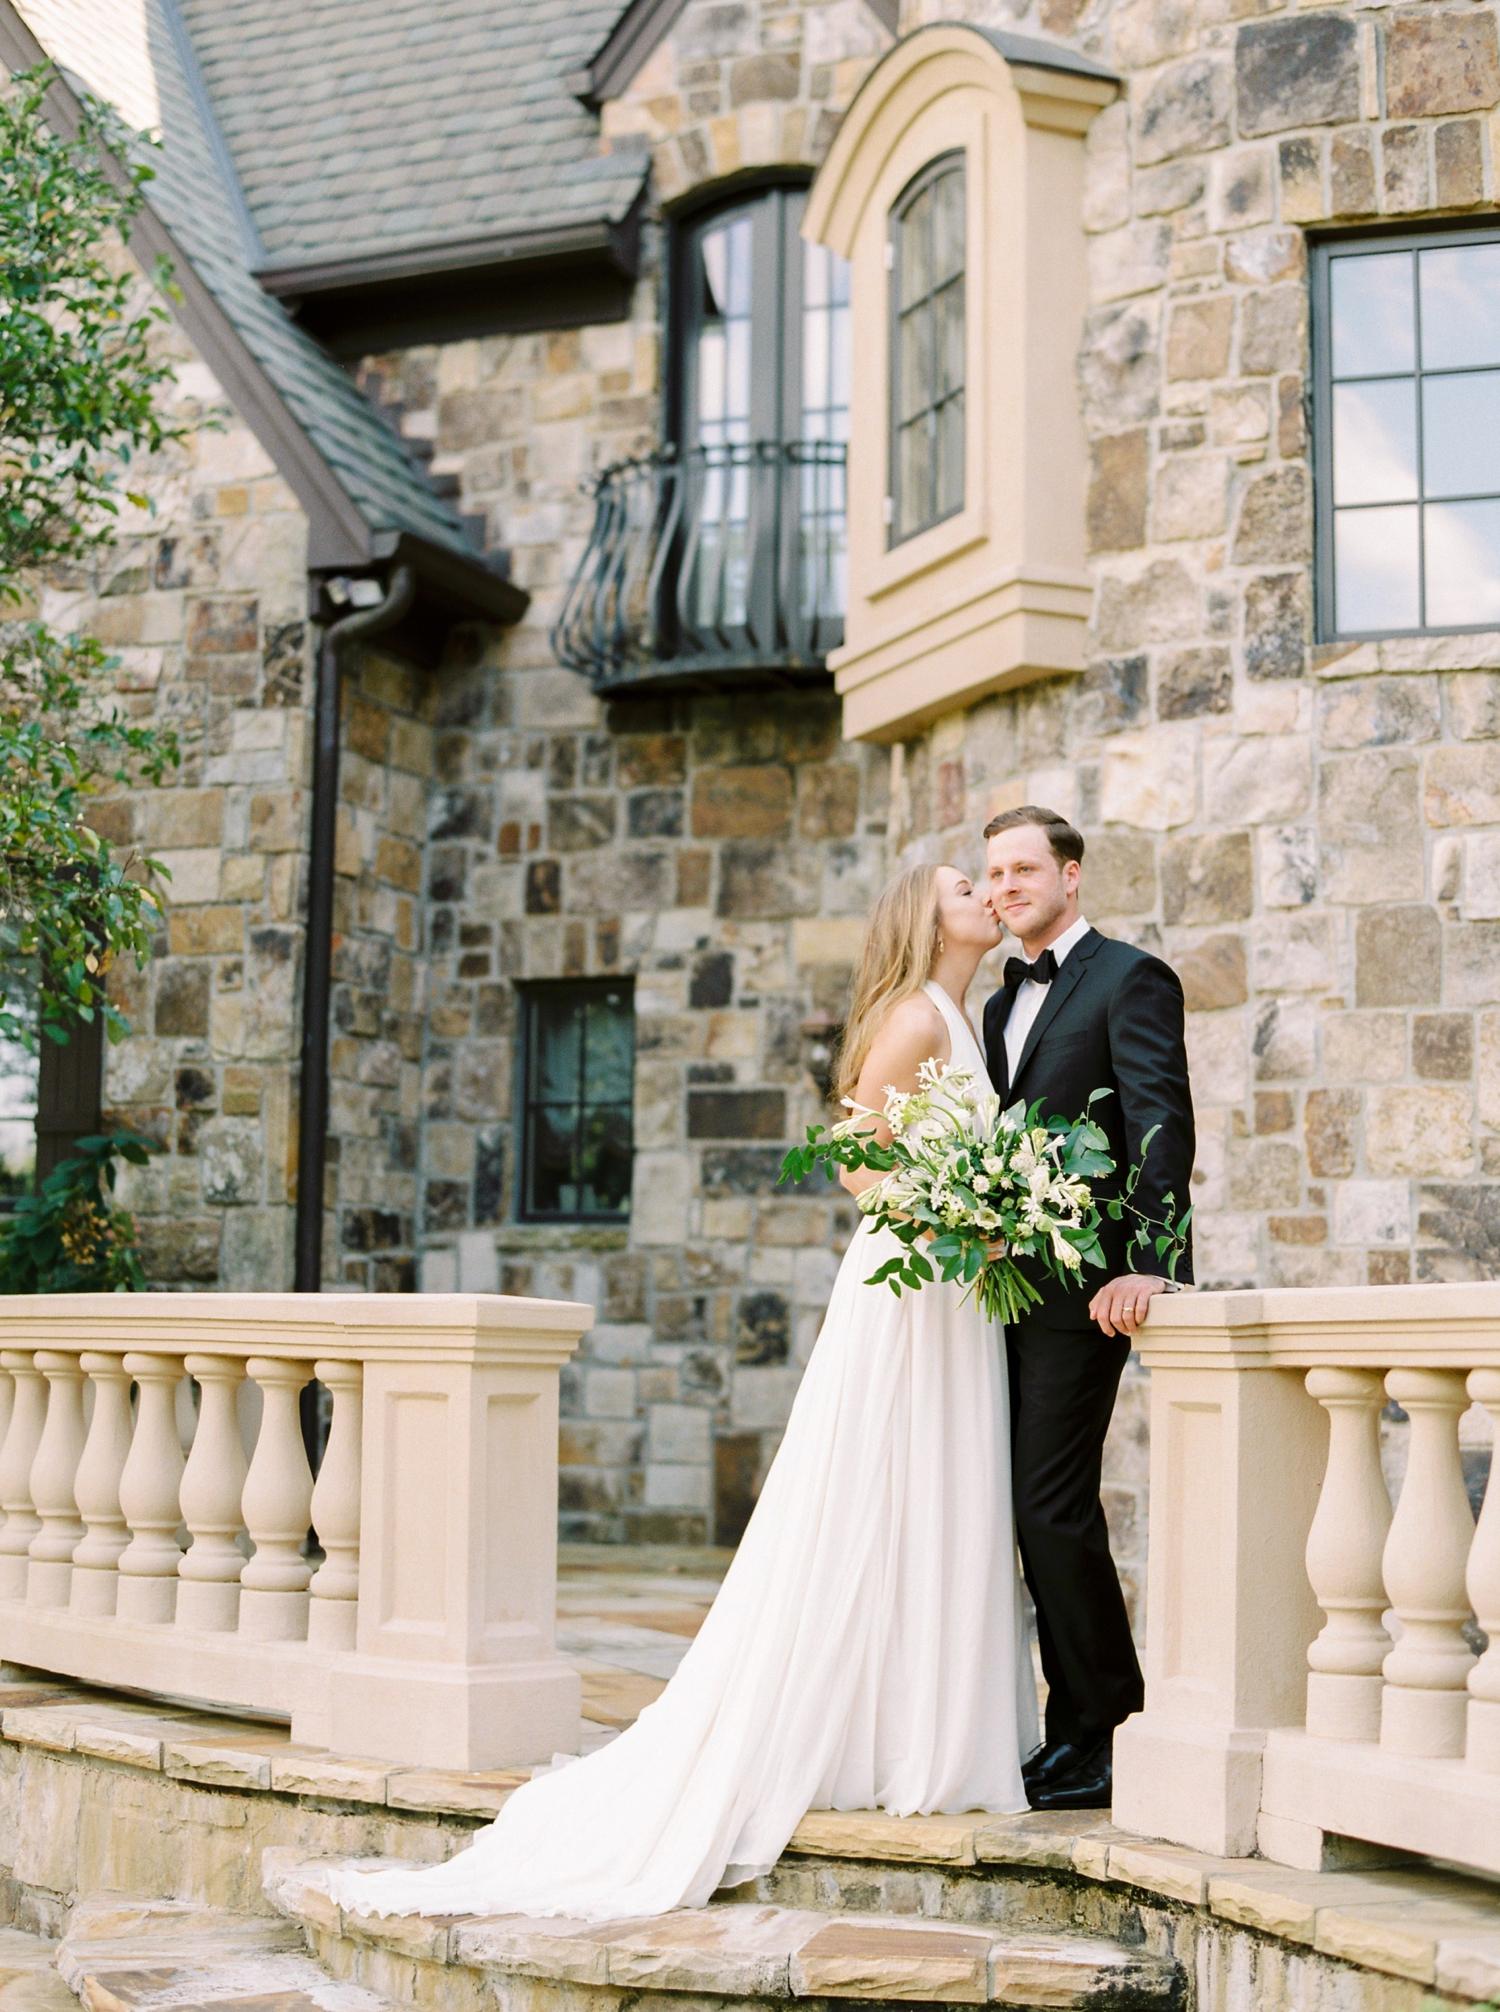 Calgary wedding photographers | georgia wedding photographers | fine art film | Justine Milton Photography | georgia wedding | wedding dress | pastel wedding | bride and groom portraits